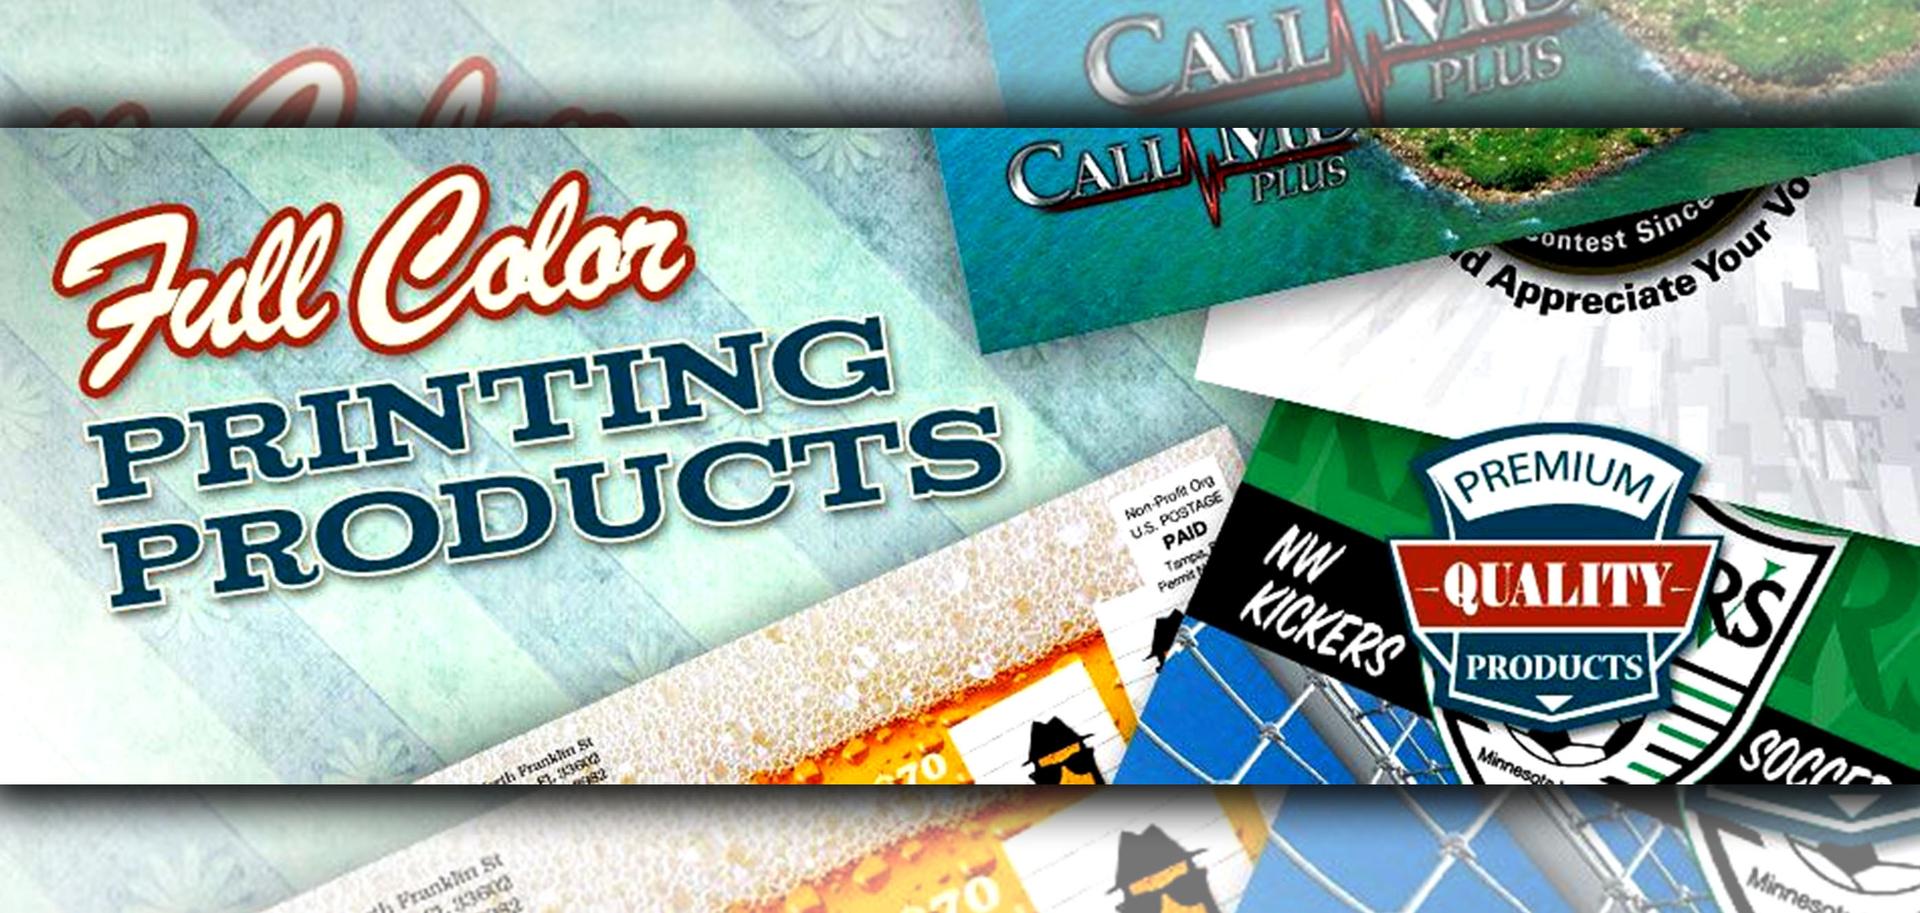 Weprint4cheap.com - Custom Tee Shirts, Business Cards, Flyers